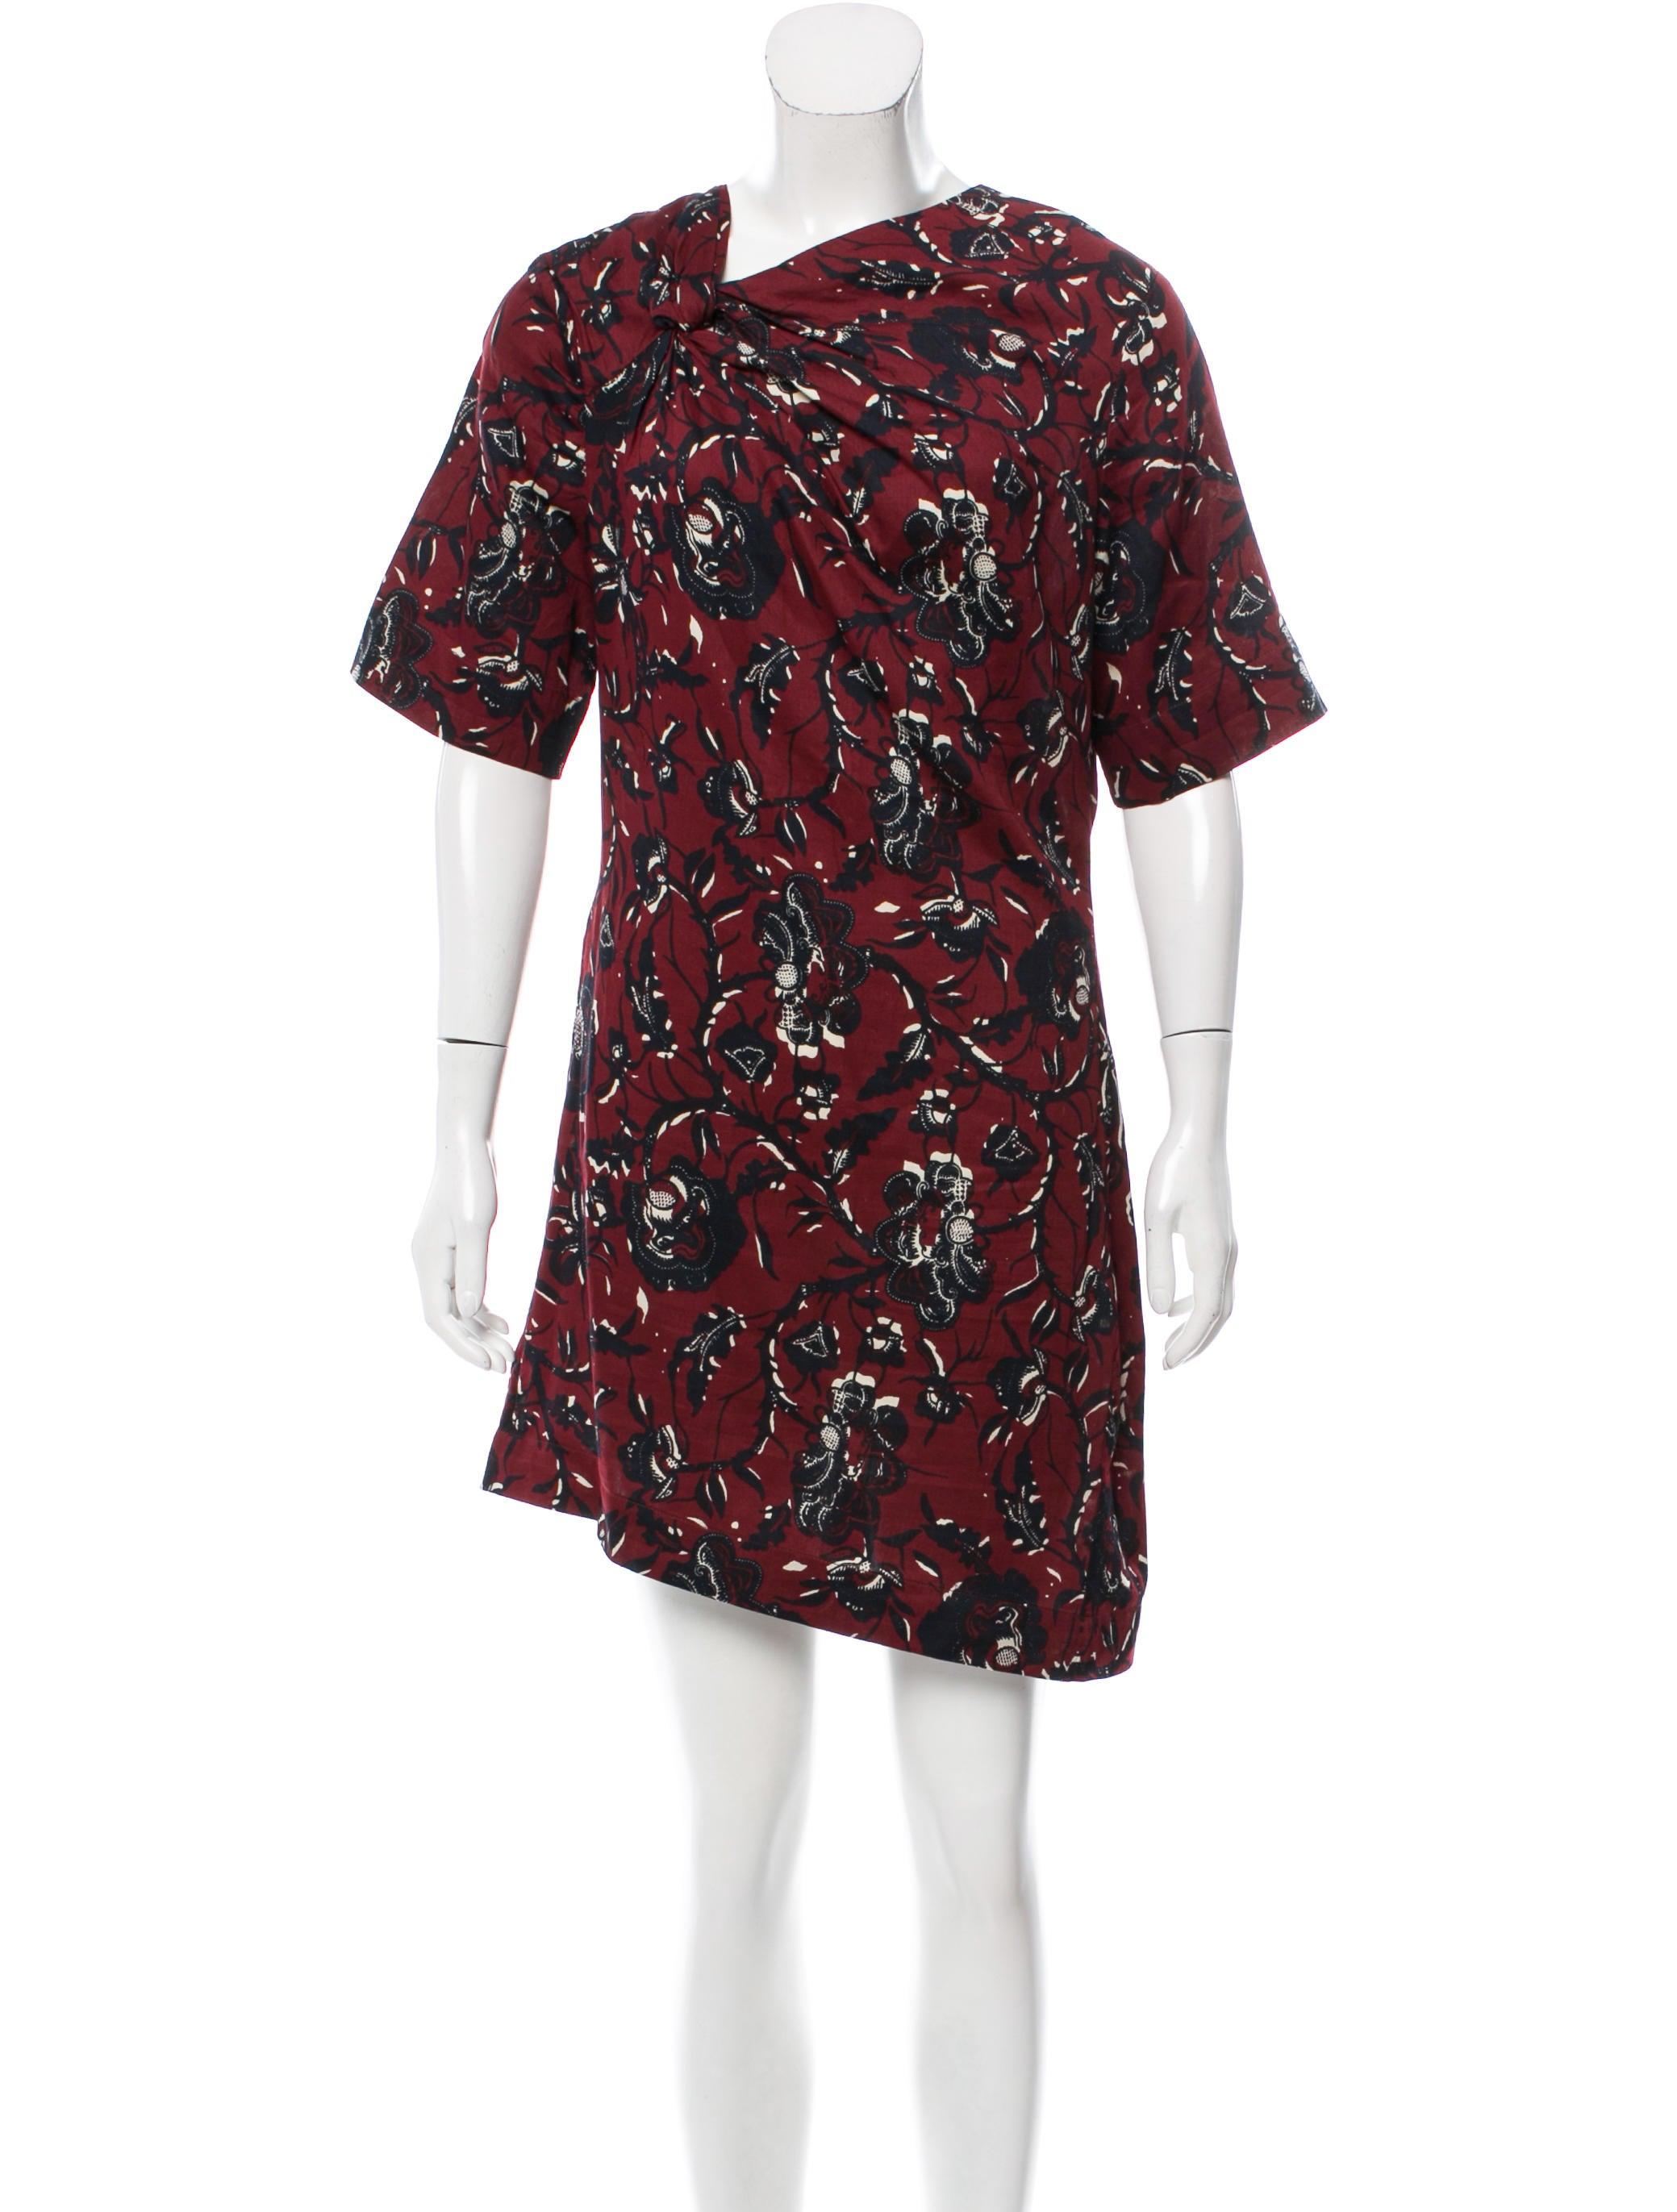 Toile isabel marant printed mini dress clothing for Isabel marant shirt dress